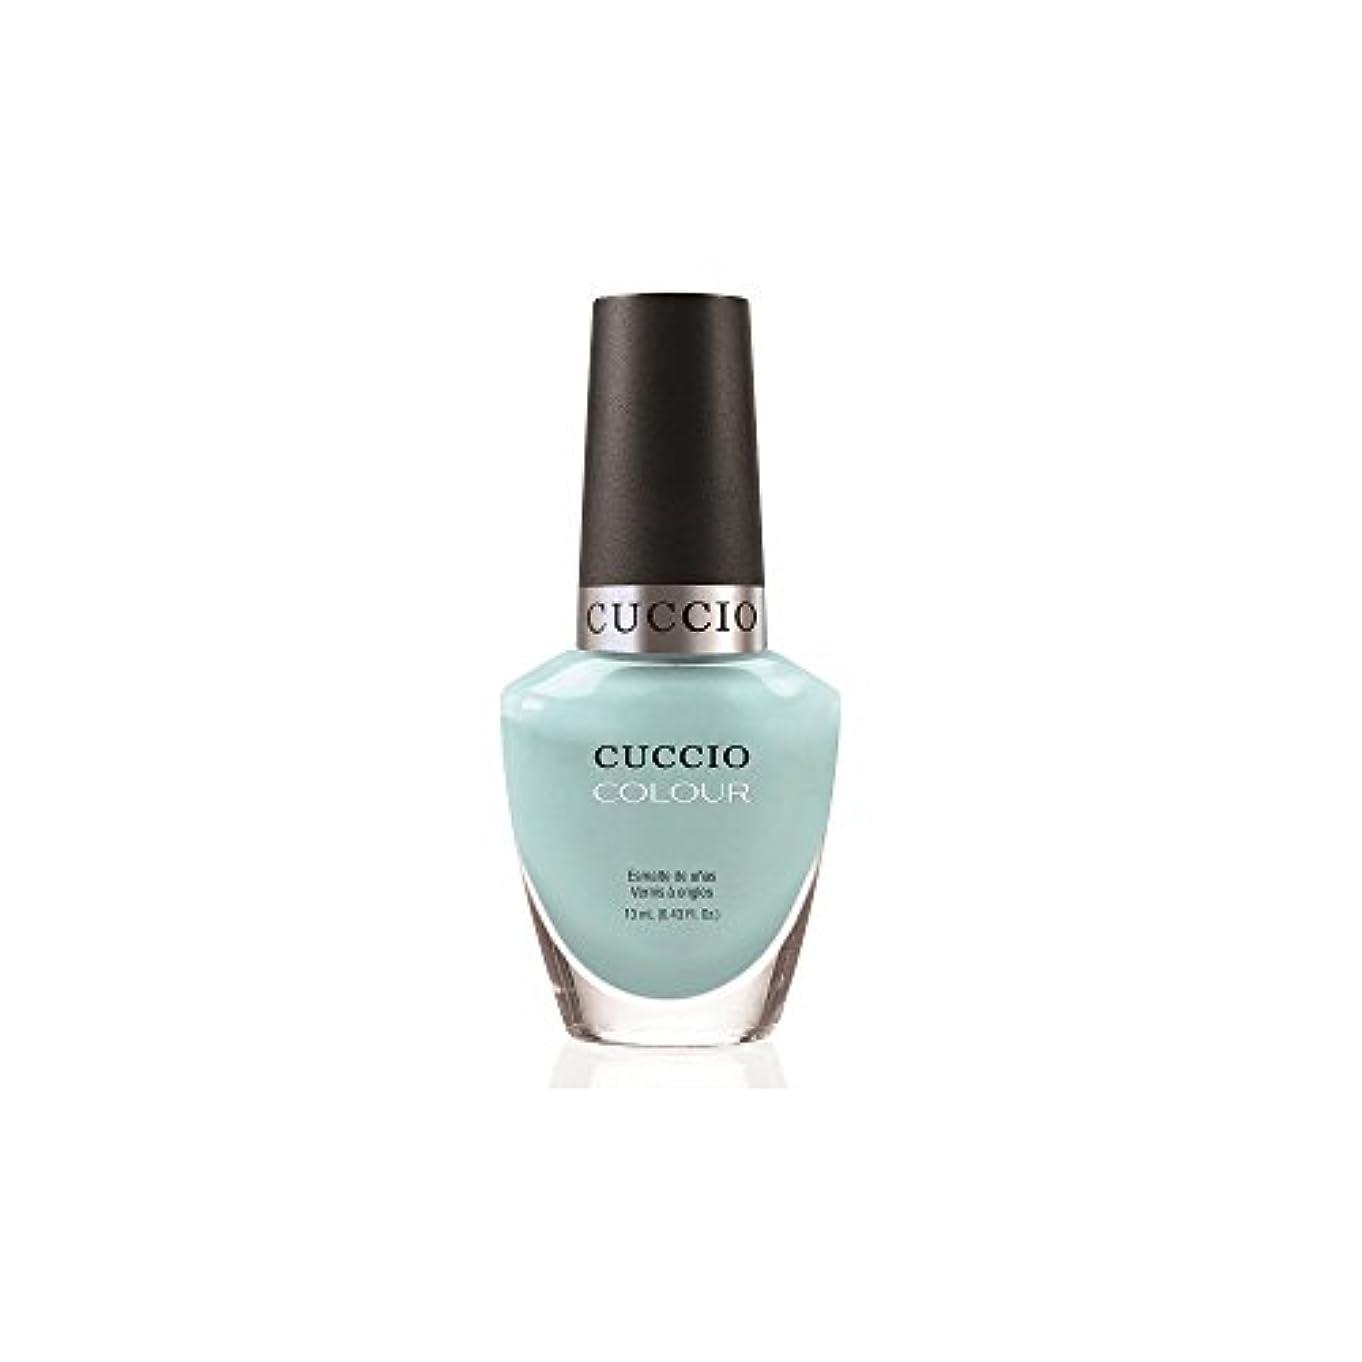 Cuccio Colour Gloss Lacquer - Blue Hawaiian - 0.43oz/13ml